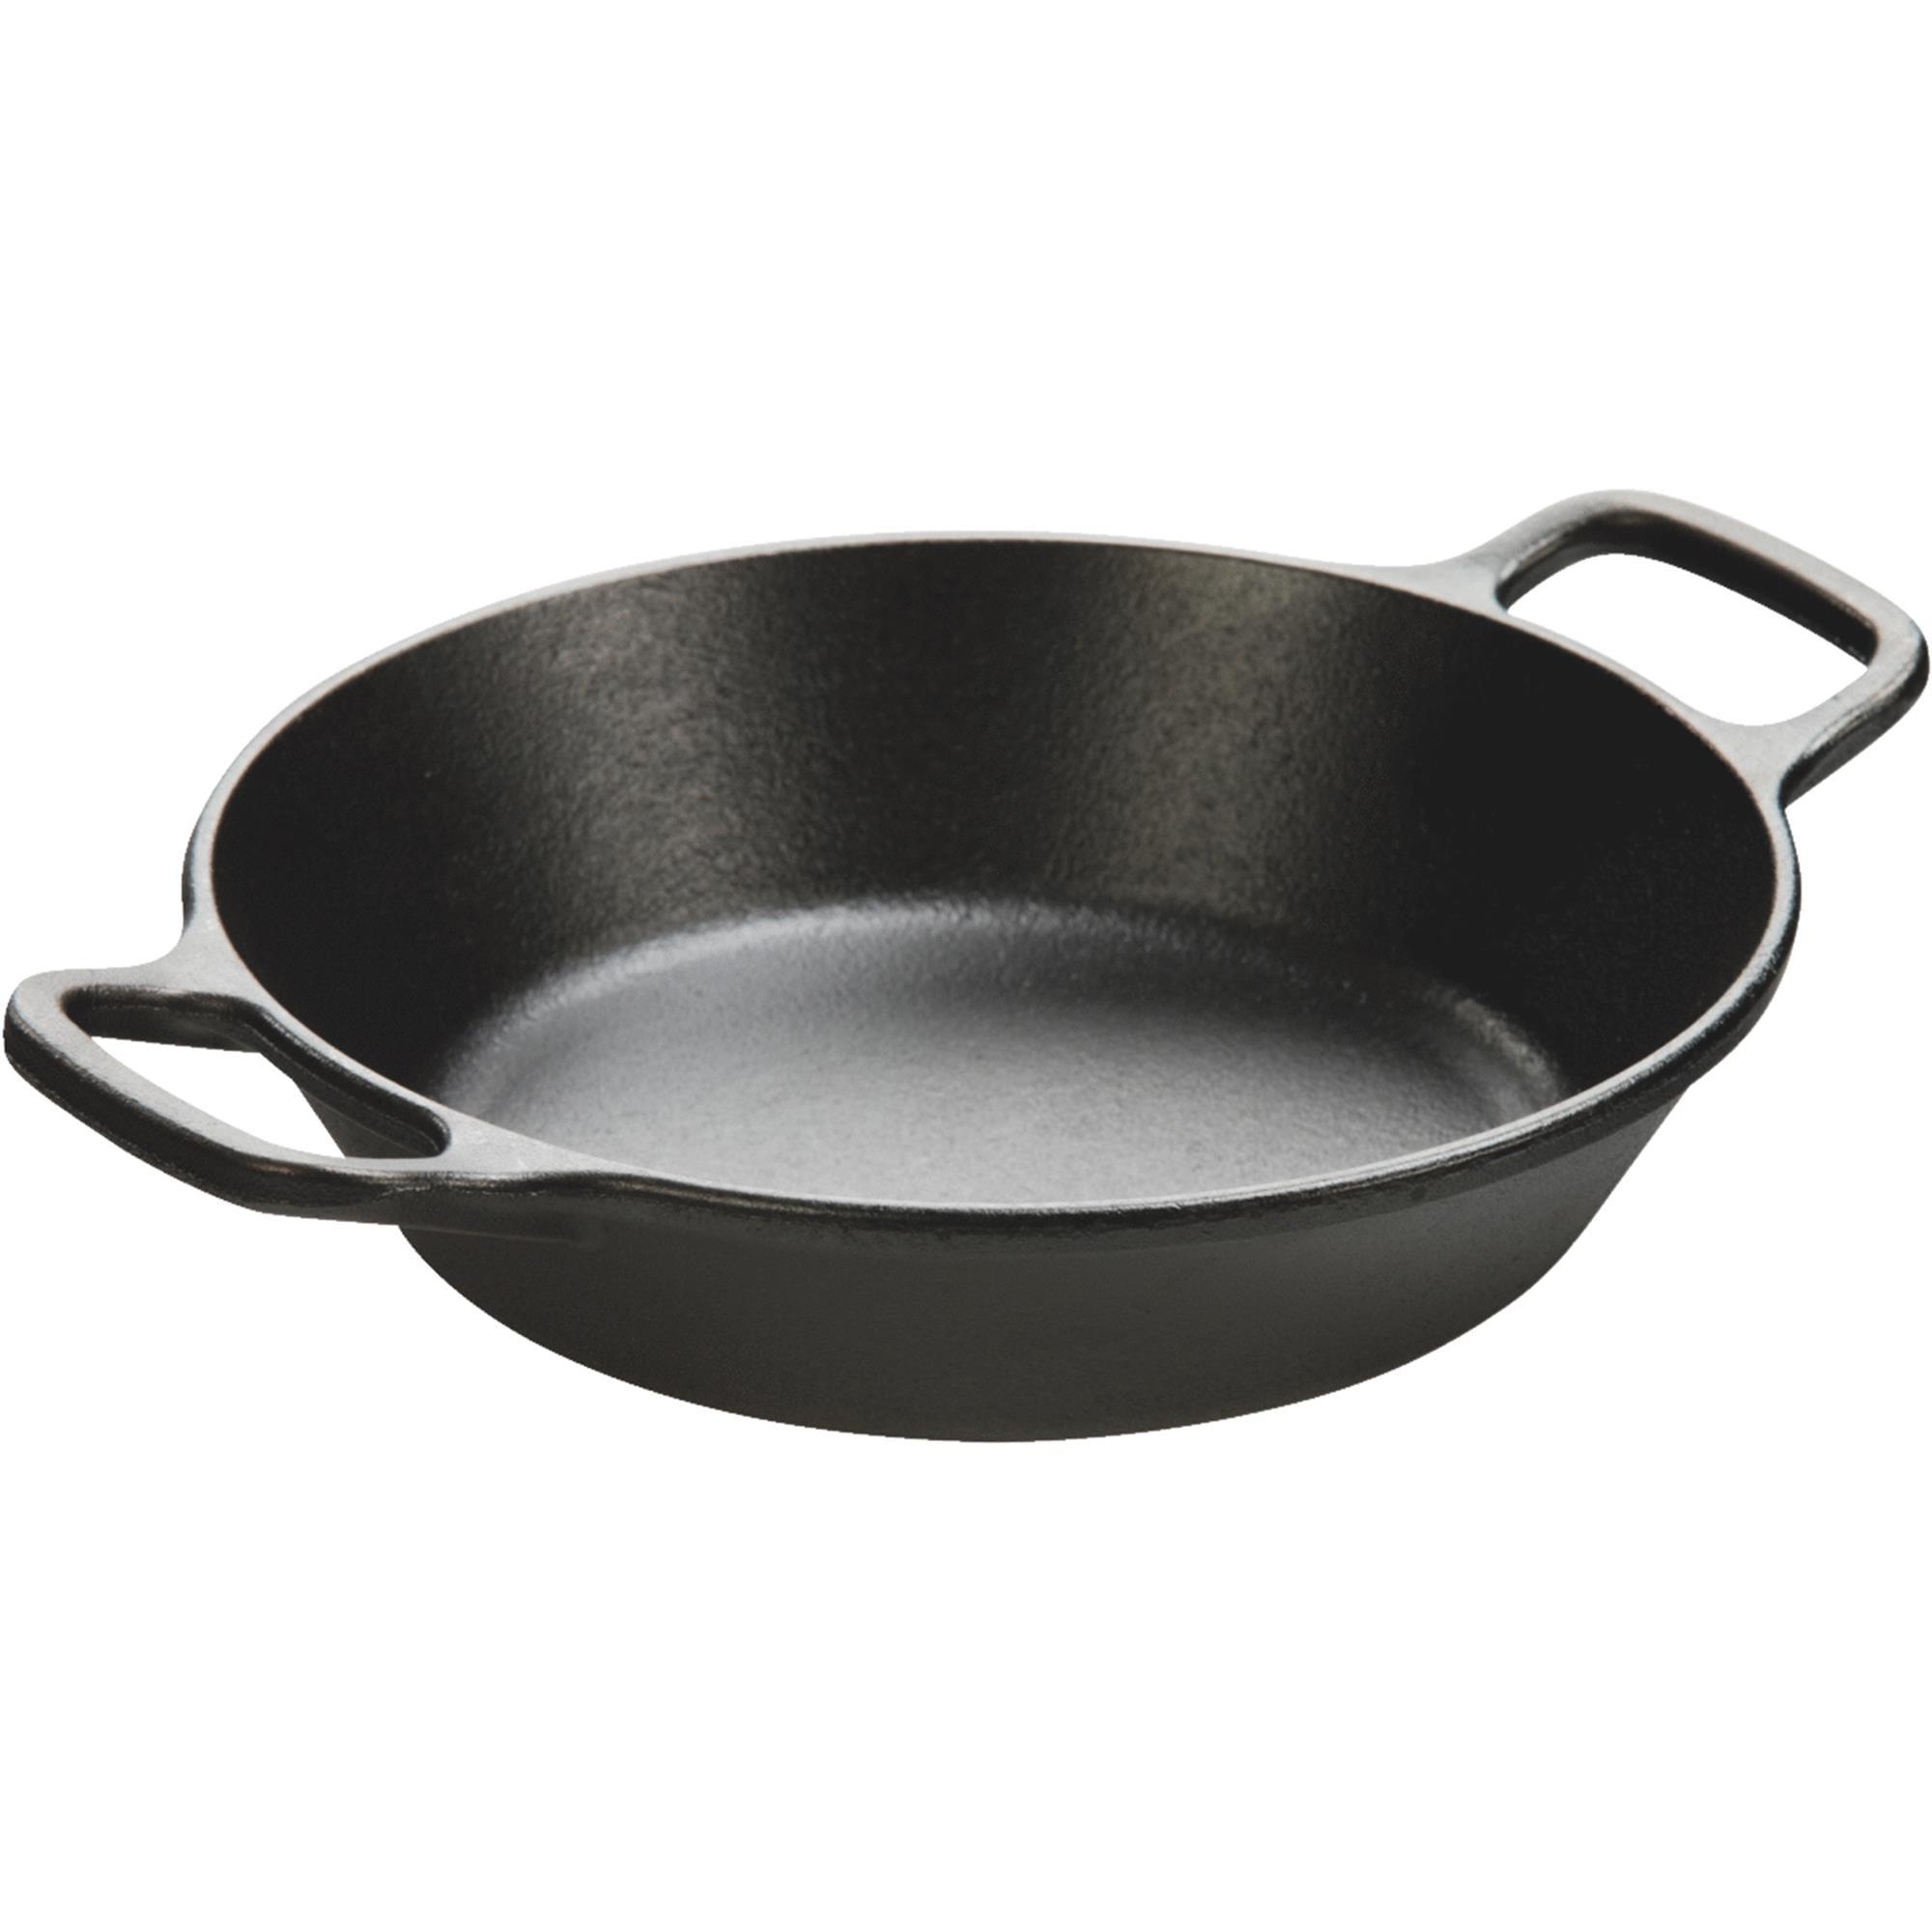 Lodge Logic 8 Inch Round Dual Handle Seasoned Cast Iron Pan, L5RPL3